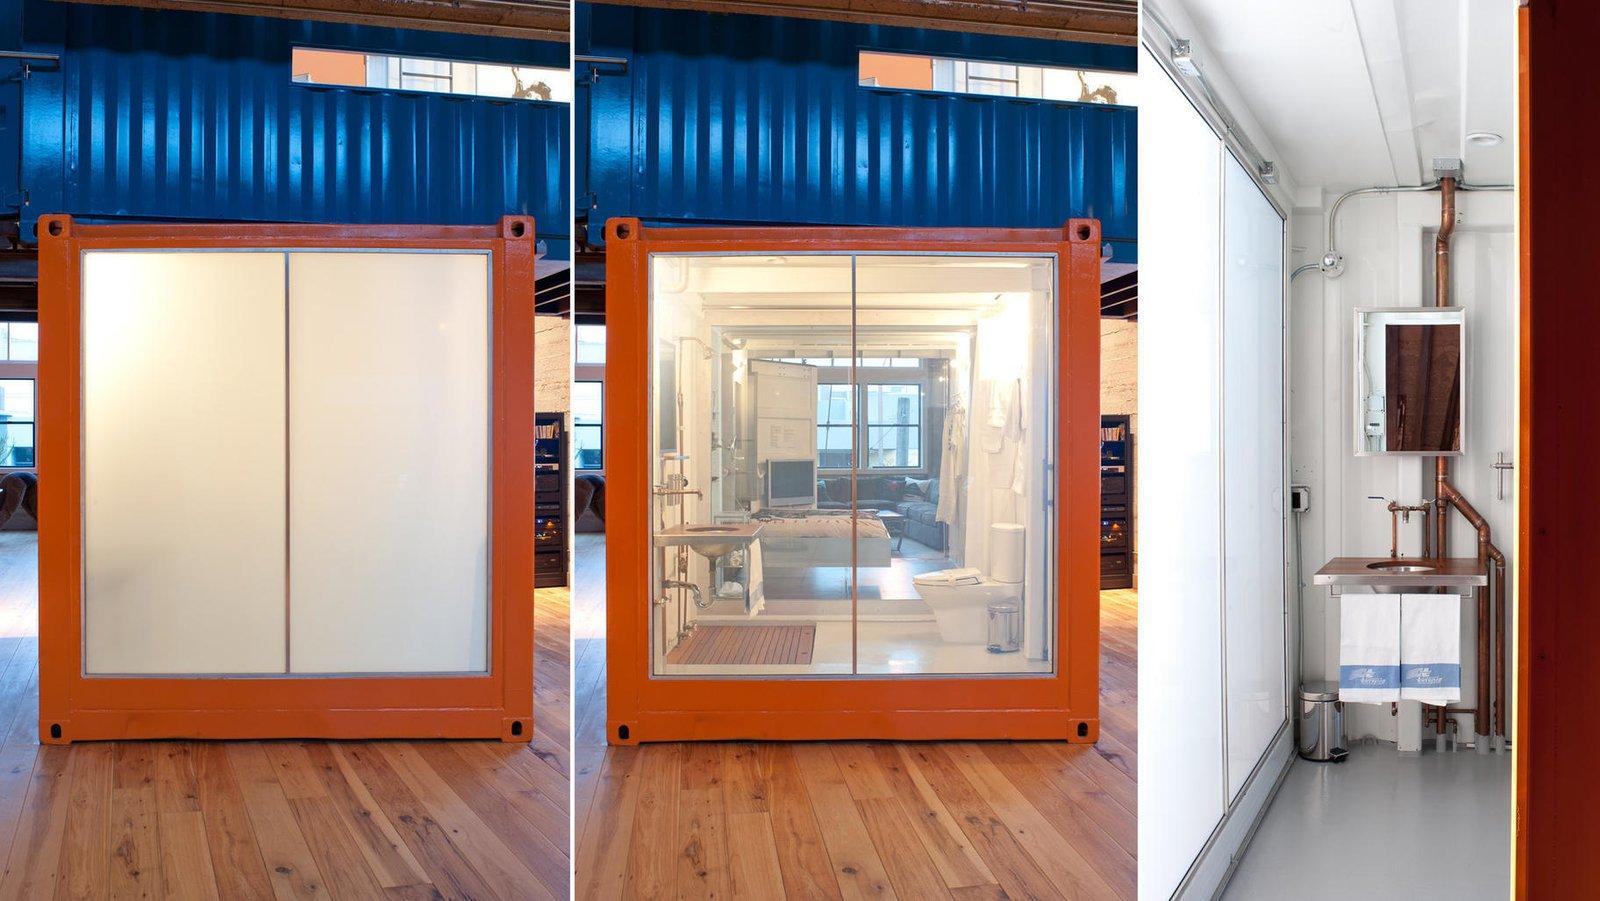 #lundberg #lundbergdesign #sanfrancisco #windows #glass #concrete #warehouse #interior #shippingcontainer #bathroom #shipping #container #hardwoodfloors #flooring  Wardell Sagan Residence by Lundberg Design